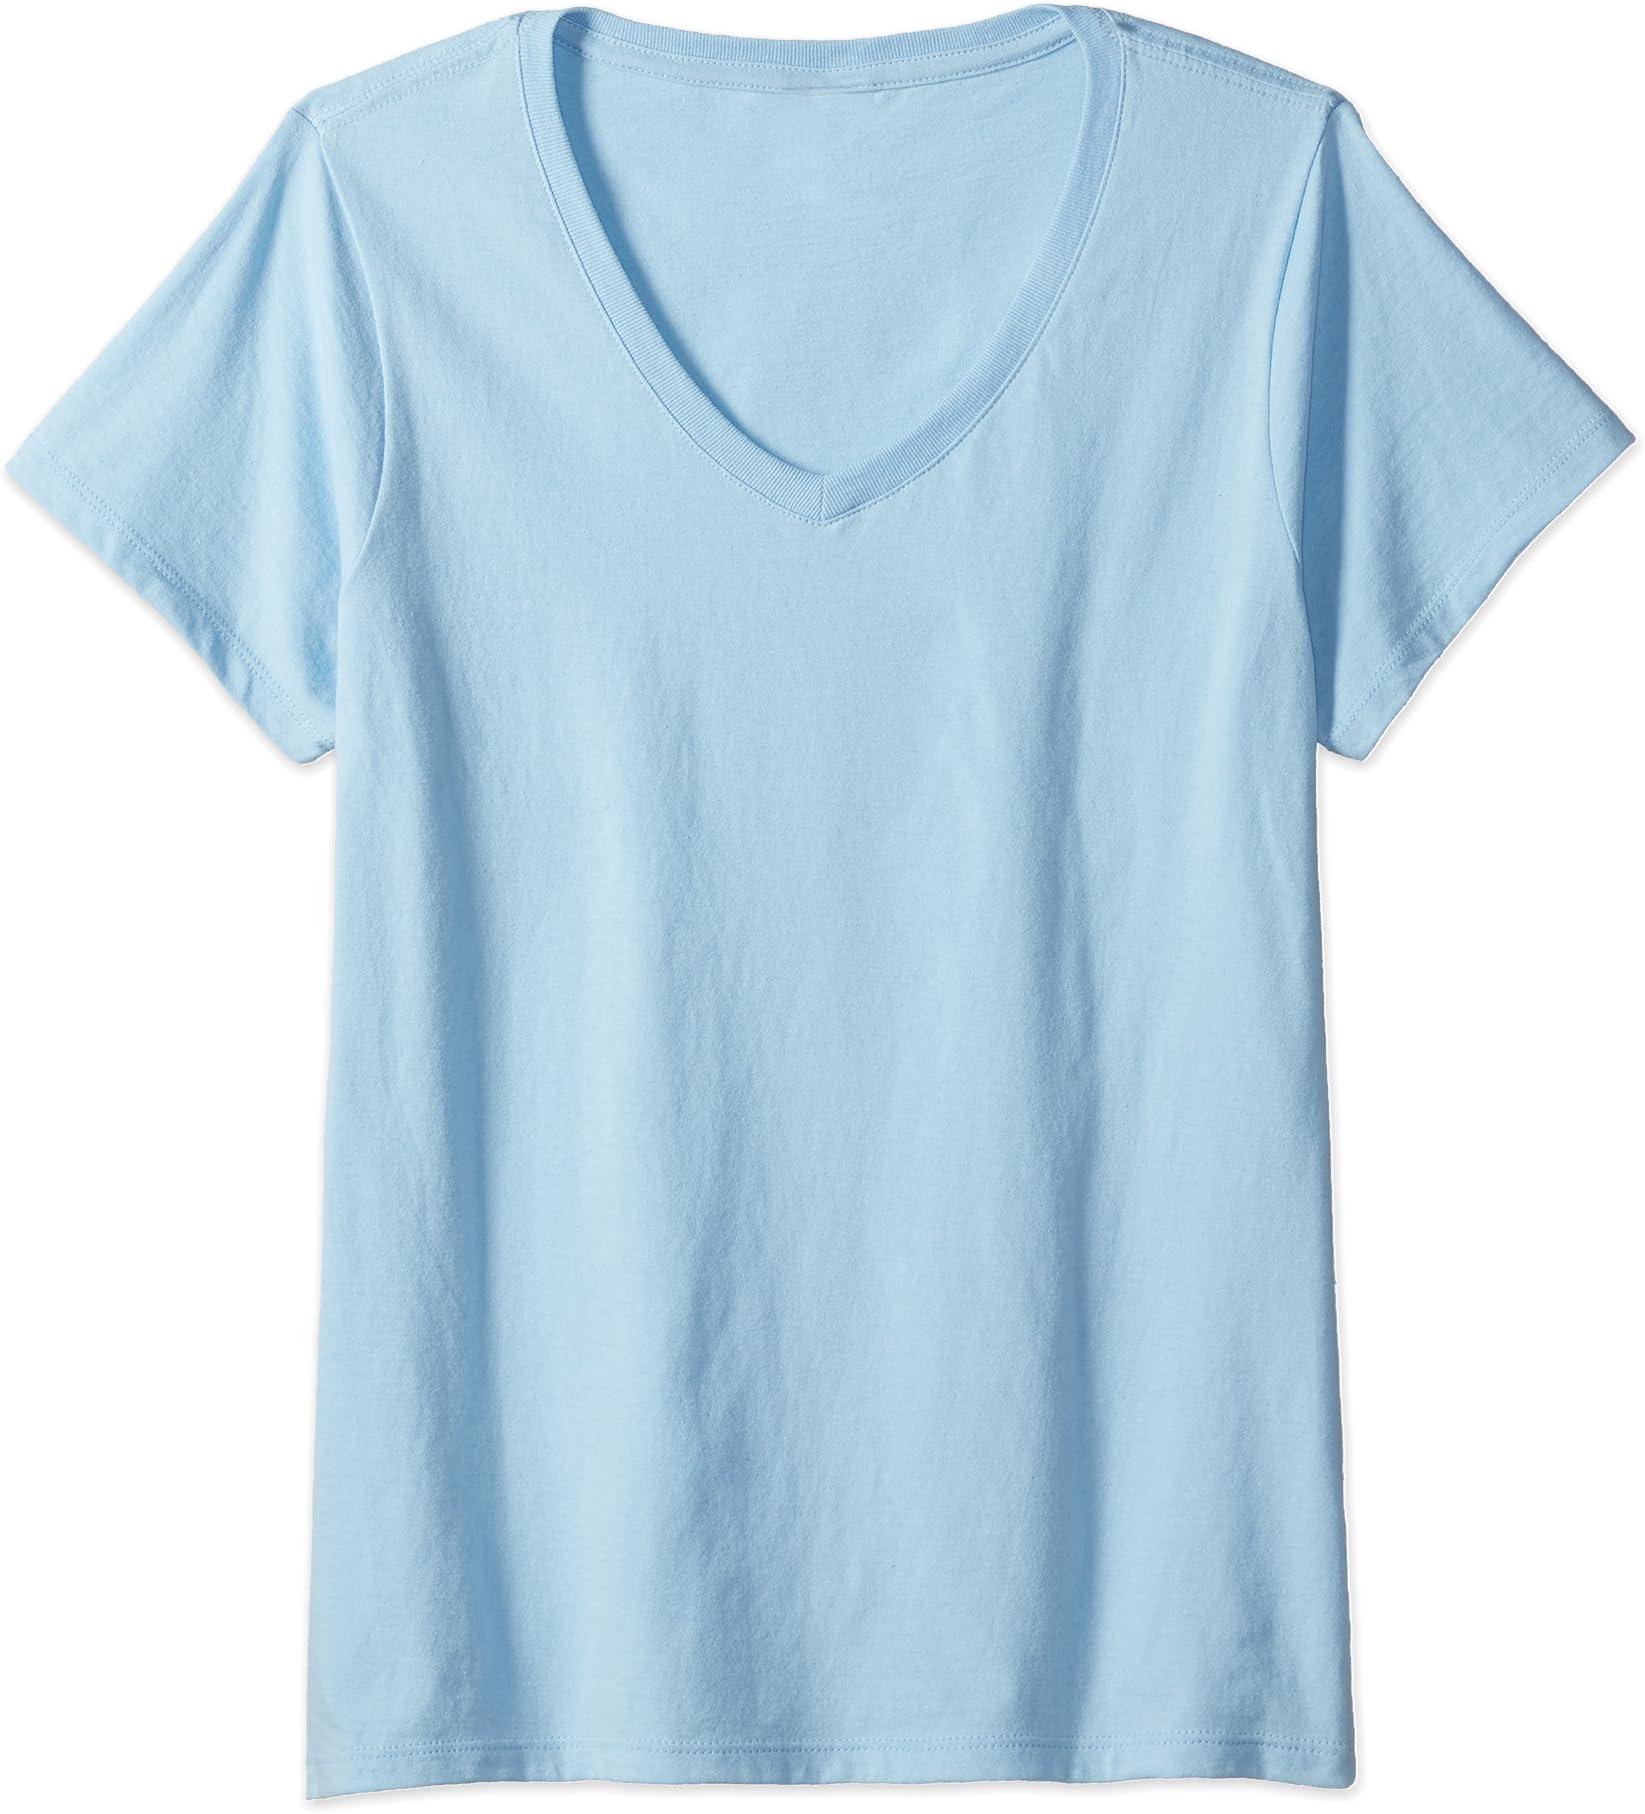 This mom Runs on Caffeine tee Shirt O-Neck Novelty Solid T-Shirt for Men